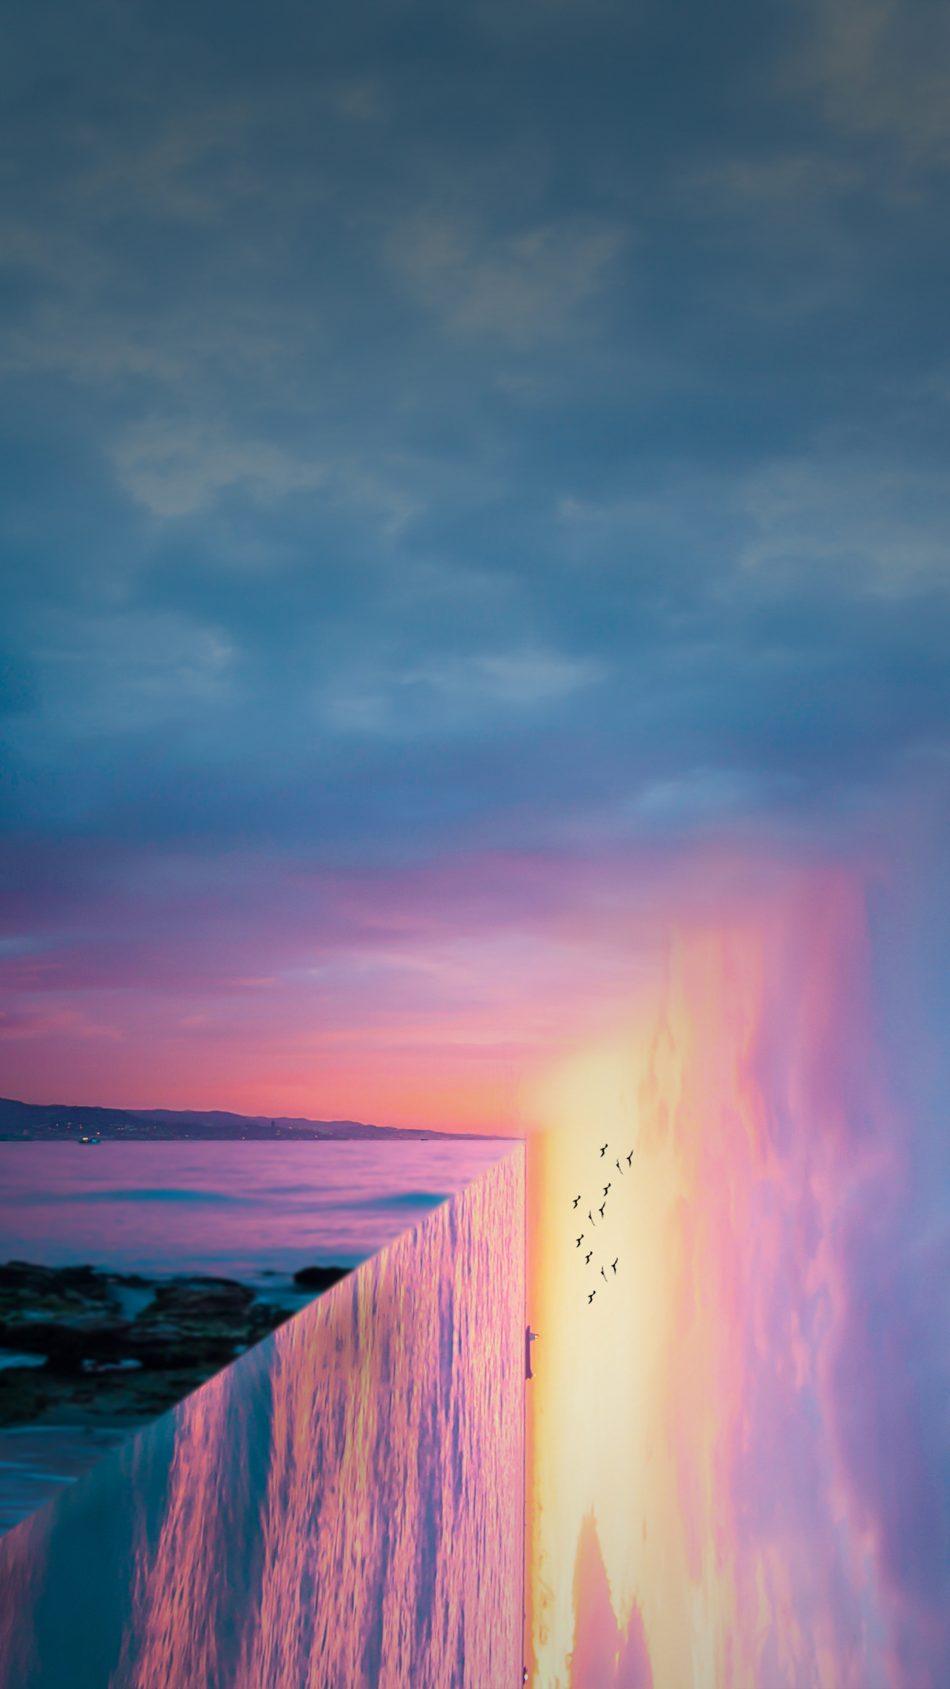 Sunset Sea Reflection Art 4k Ultra Hd Mobile Wallpaper Art